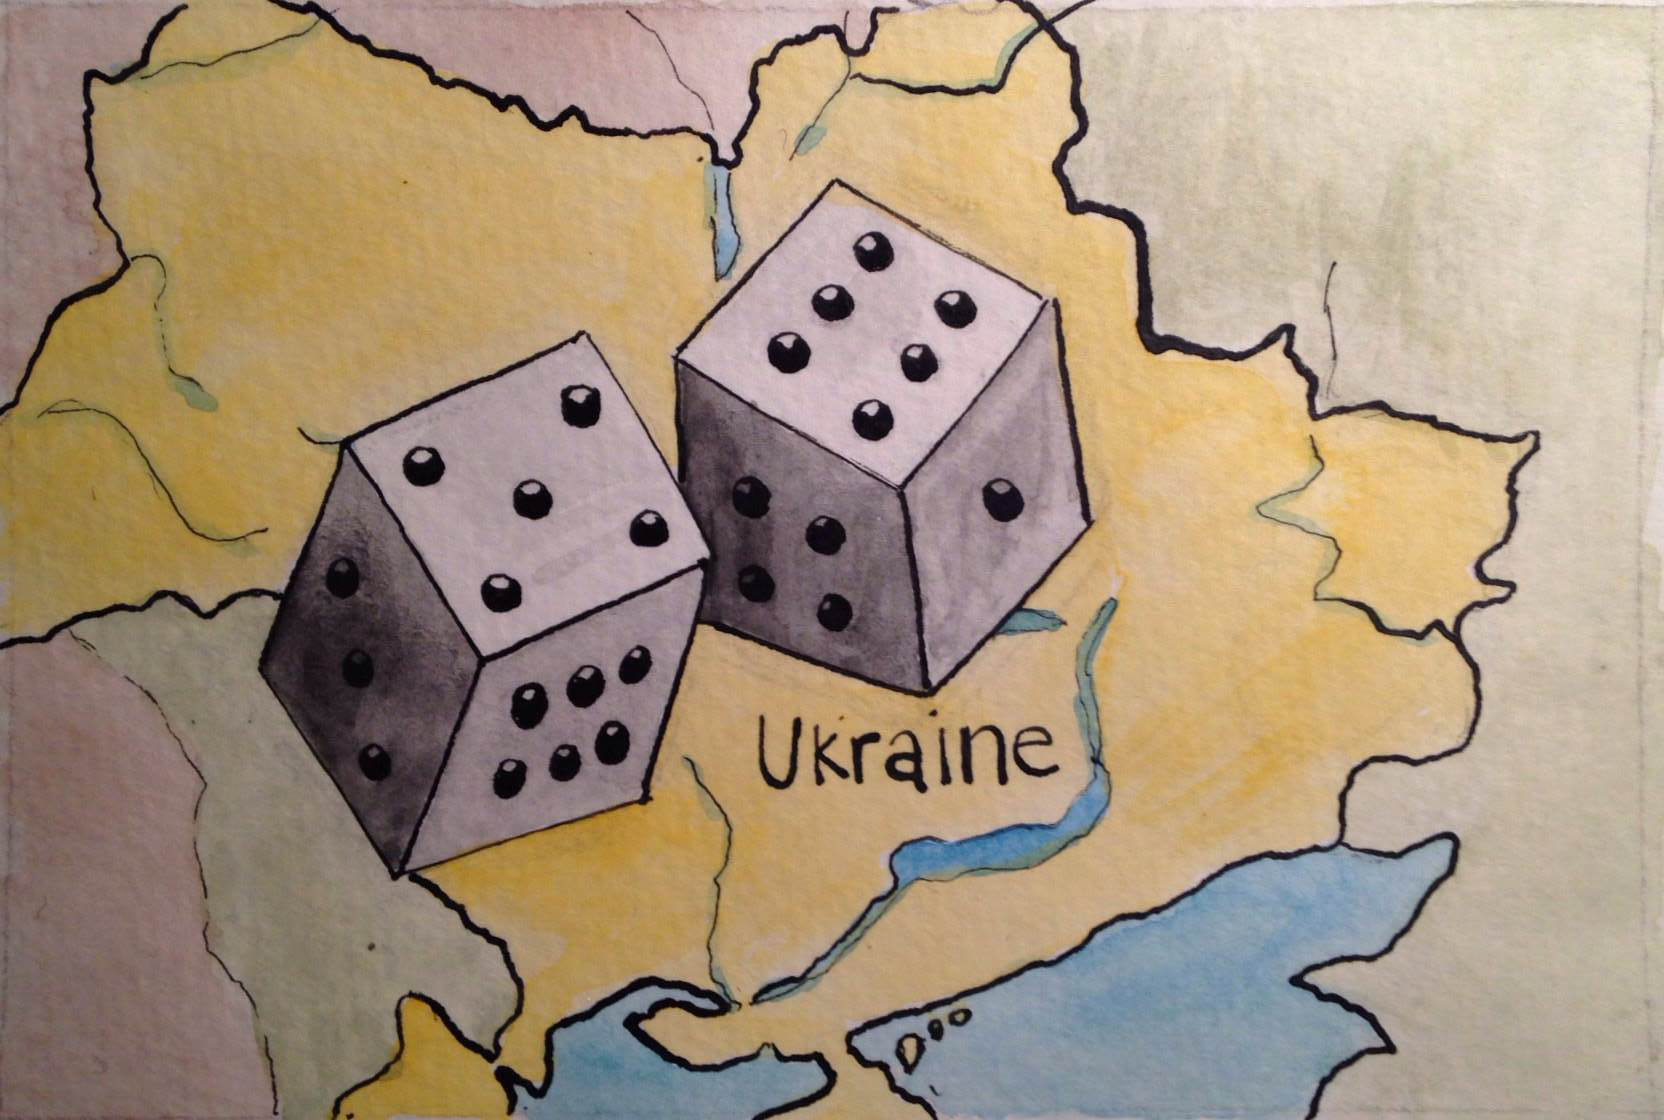 ukraine edited